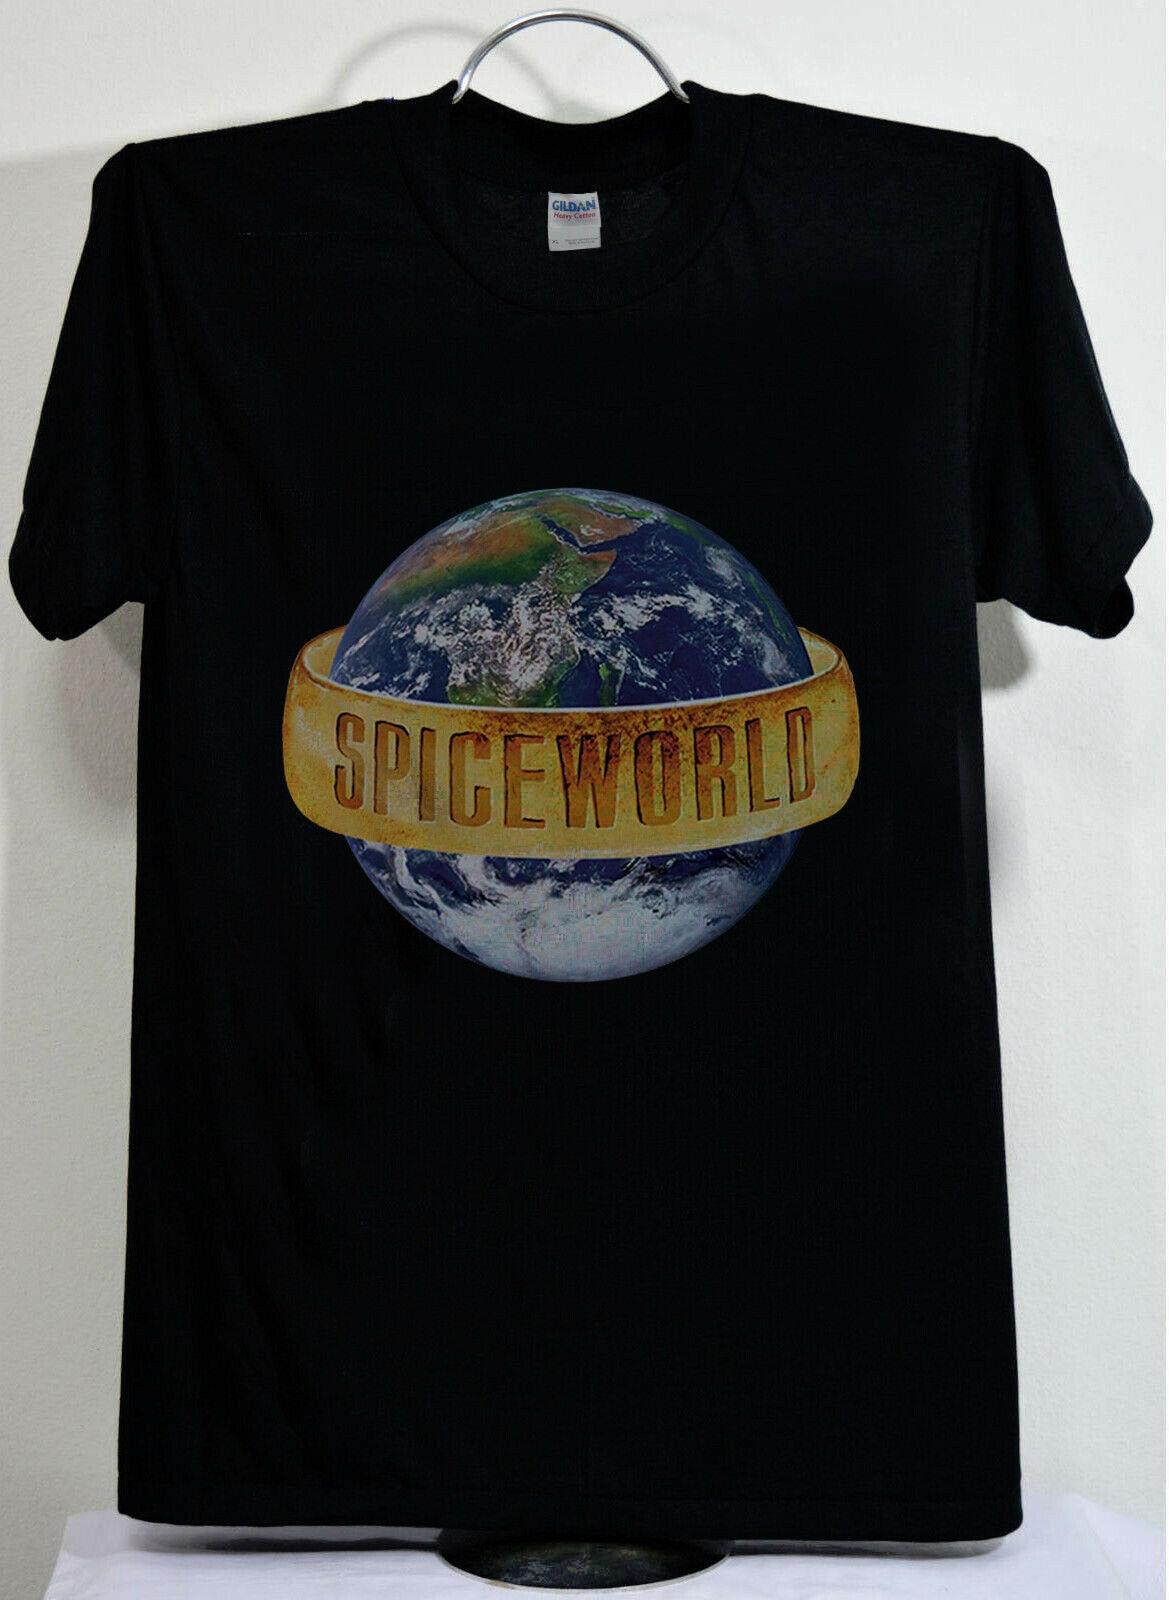 New Spice Girls Tour 2019 Concert Spice World Event Shirt Black & White